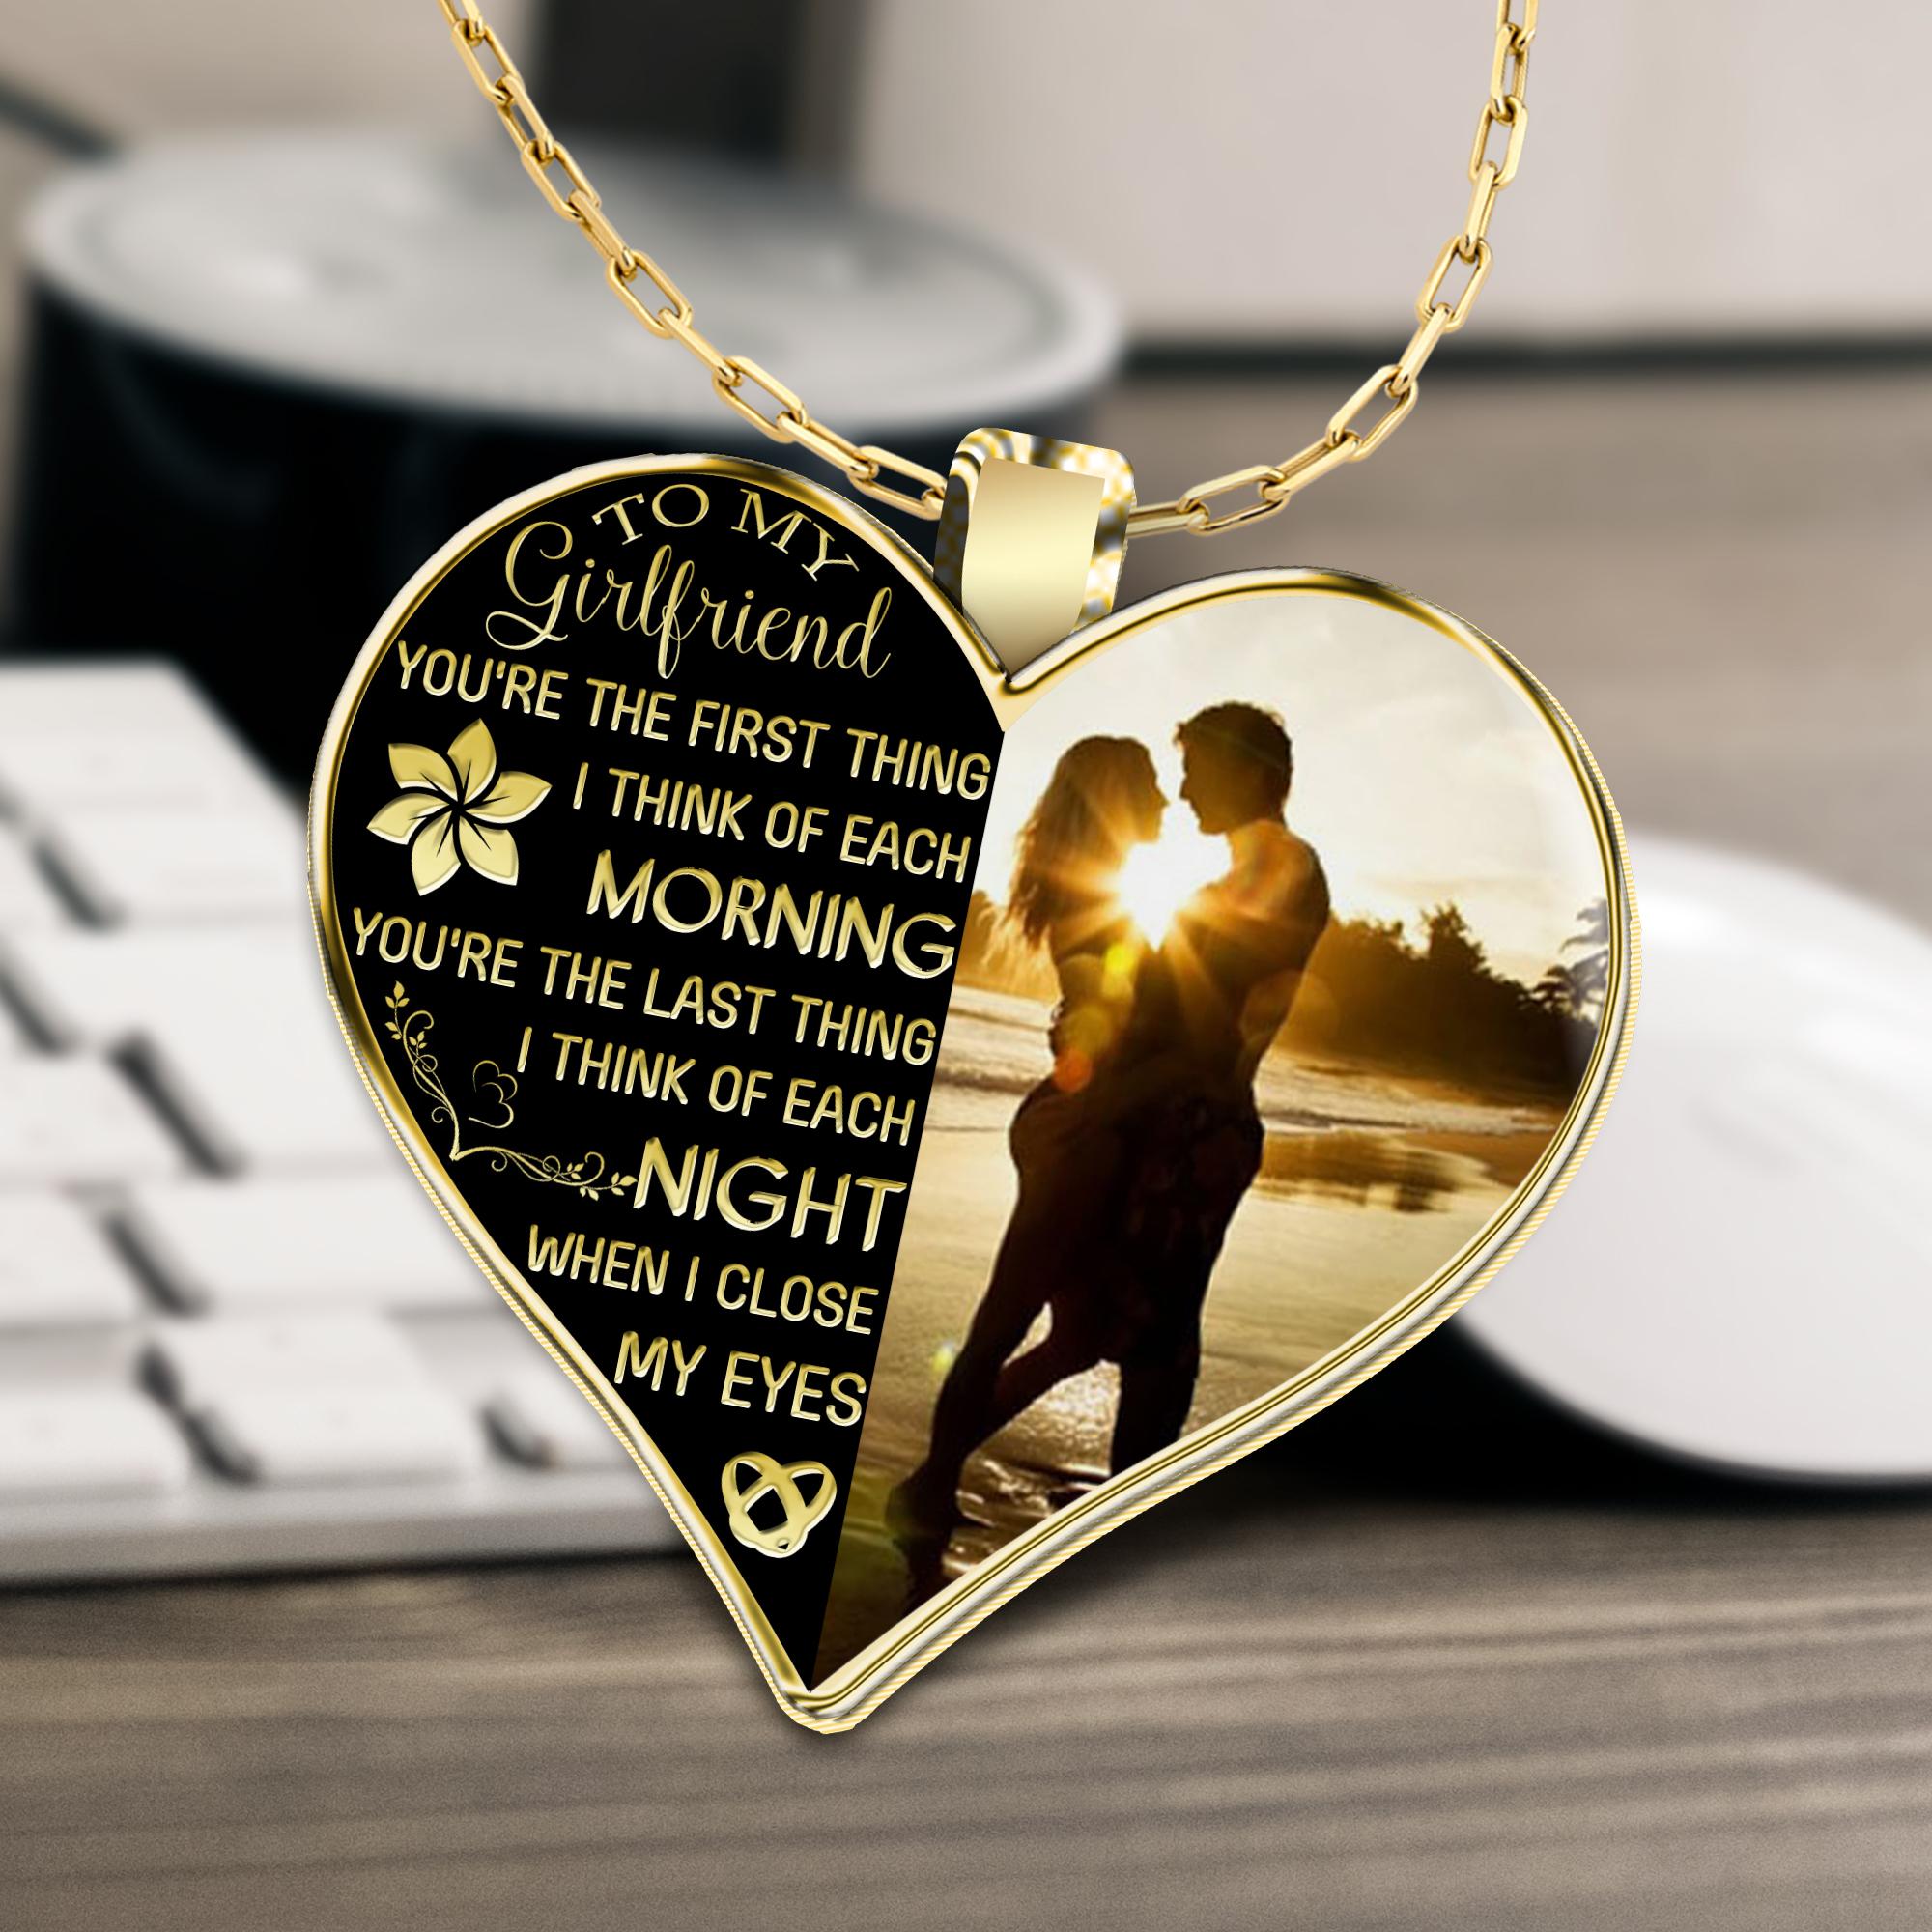 15++ Best jewelry to get your girlfriend ideas